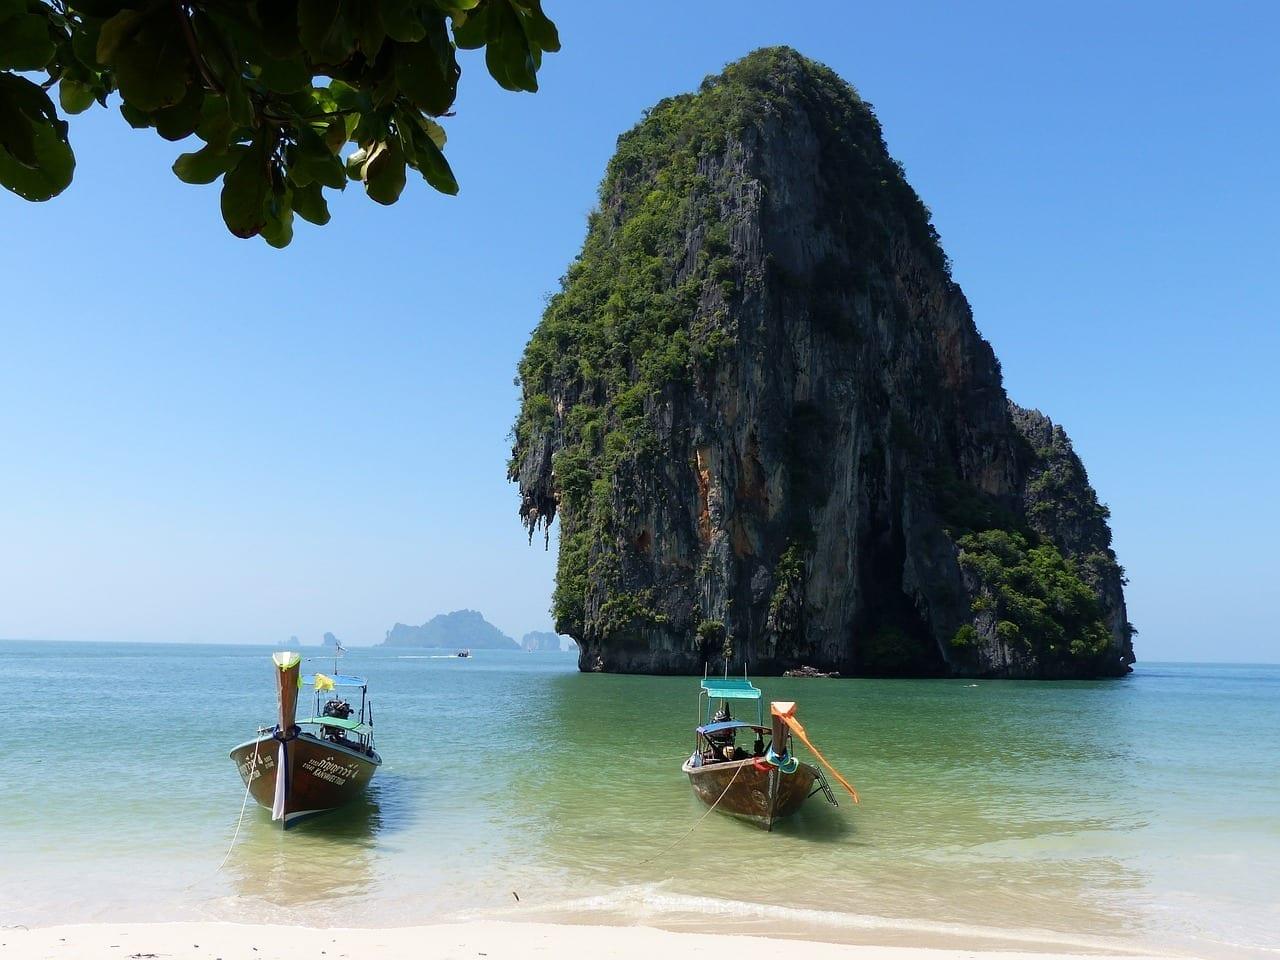 Barcos Habló La Playa Krabi Tailandia